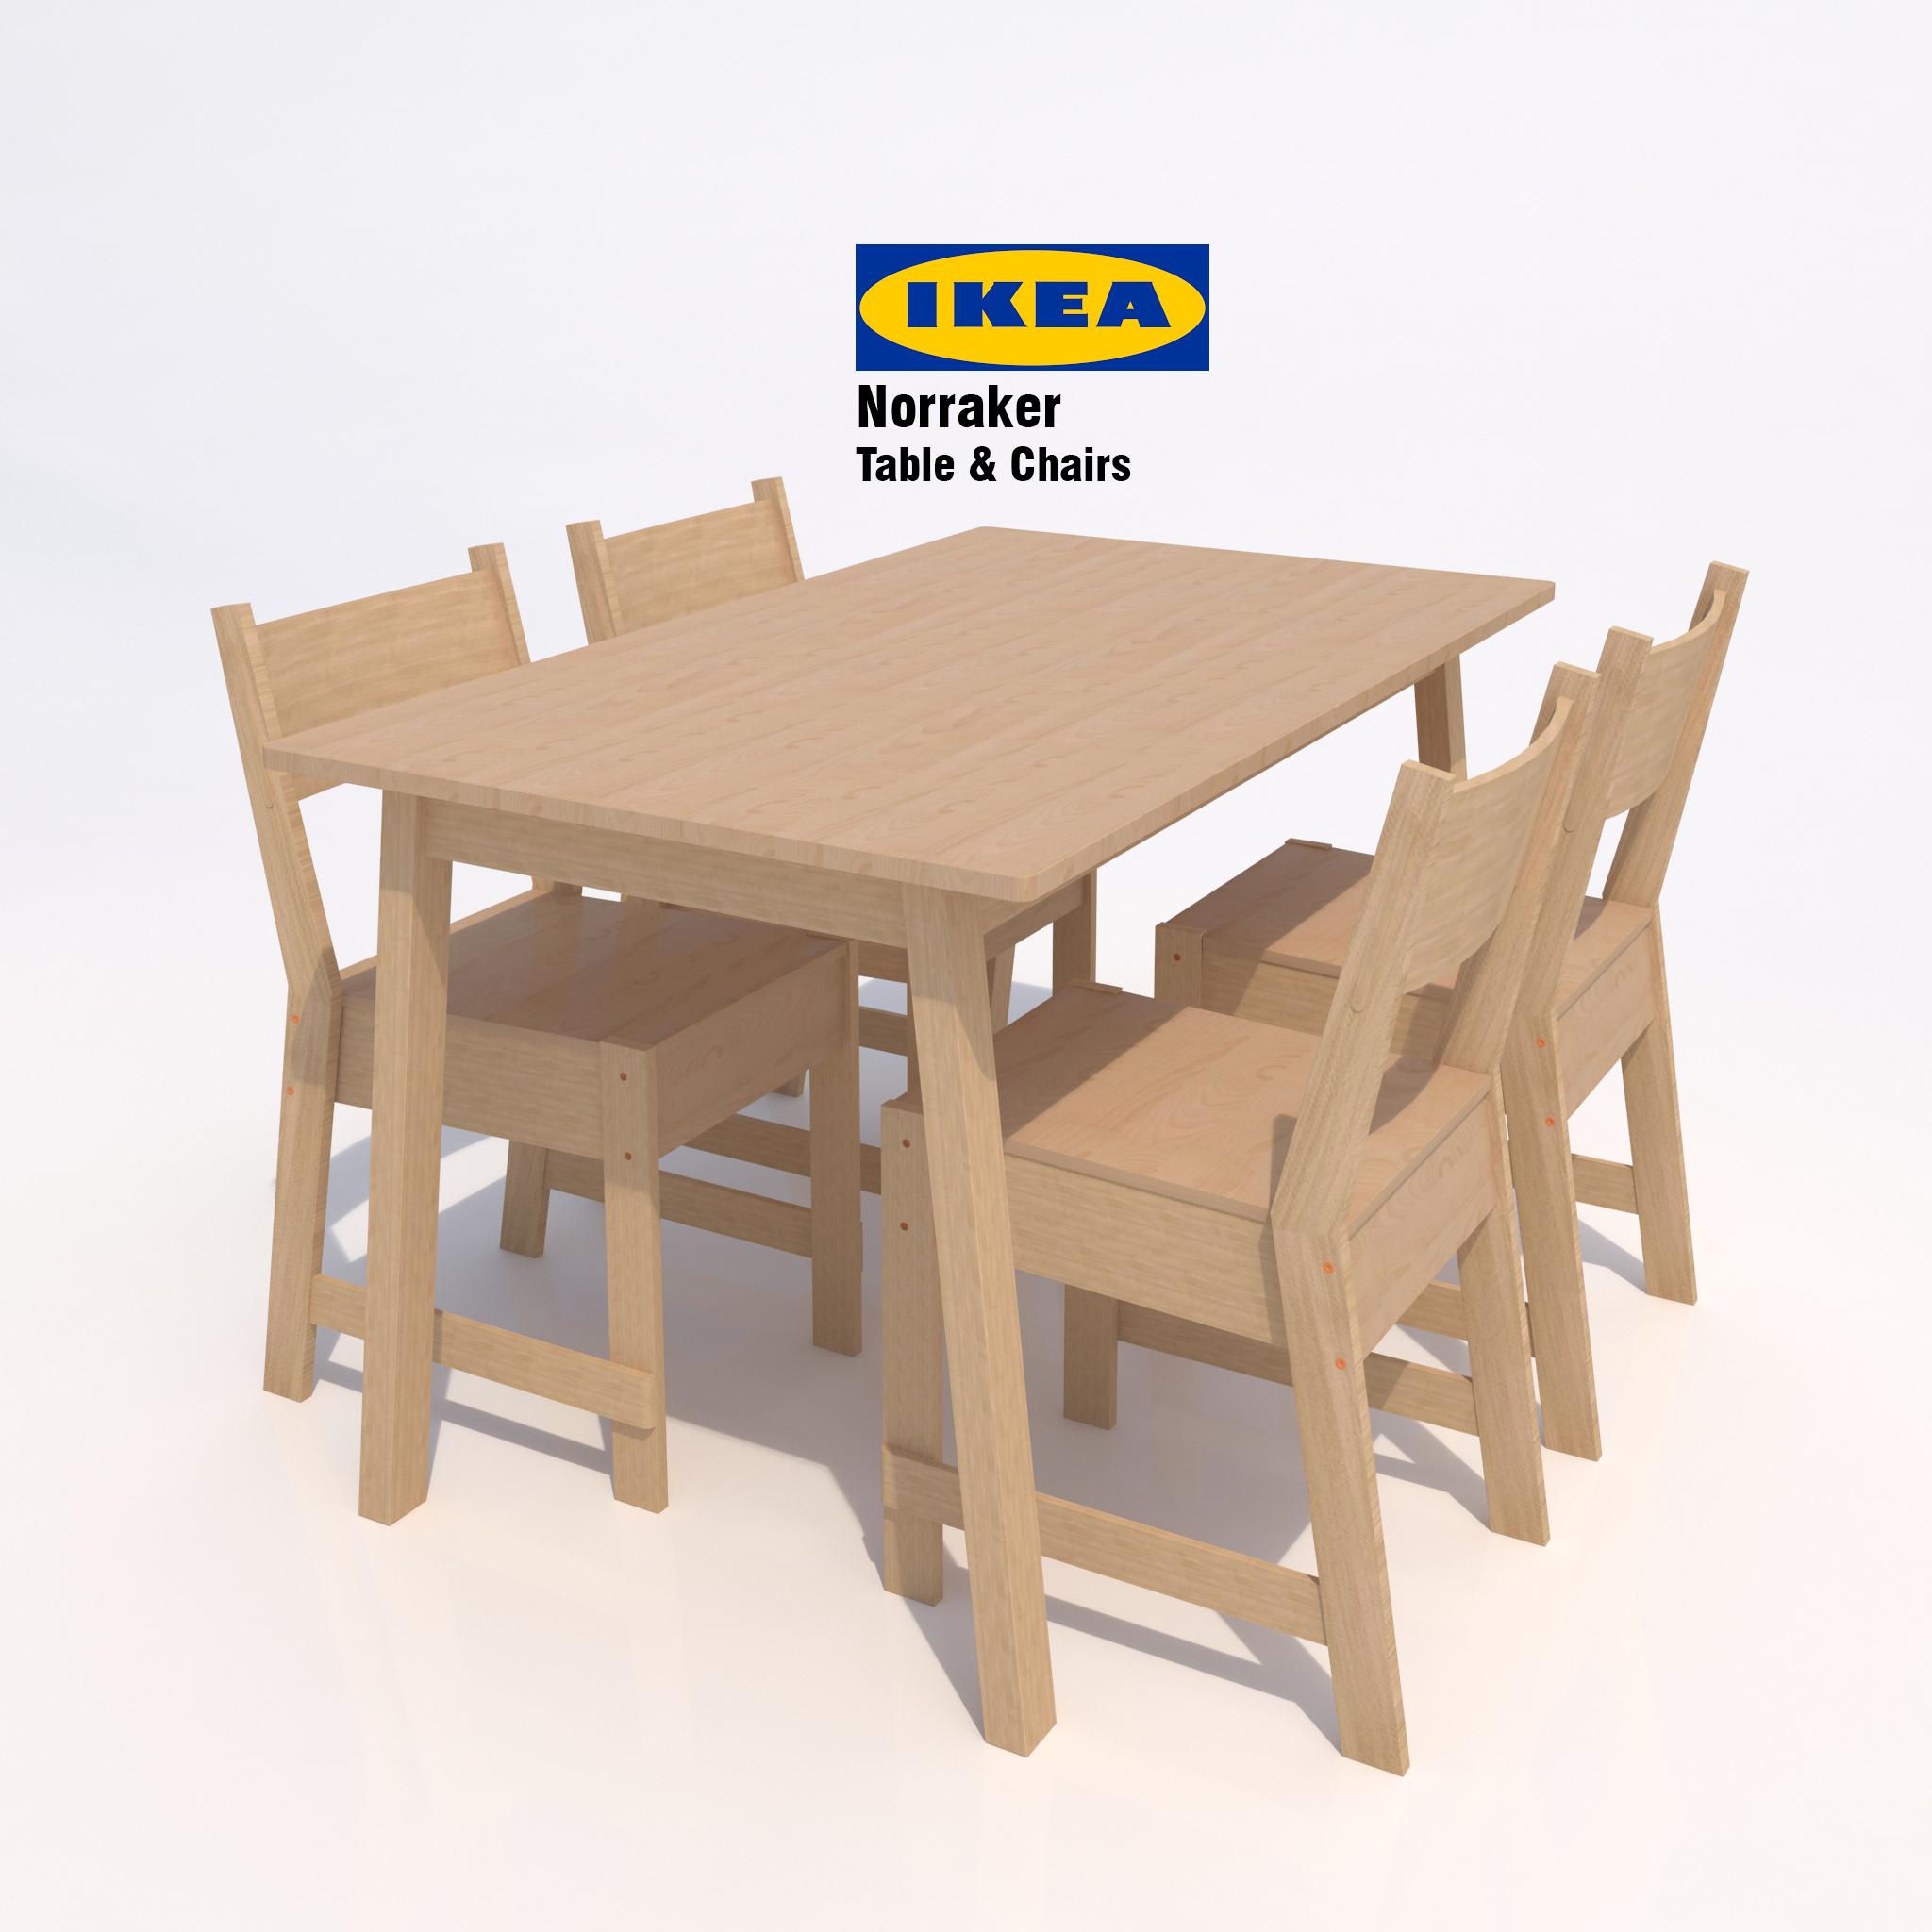 Ikea Norraker Dining Set 02